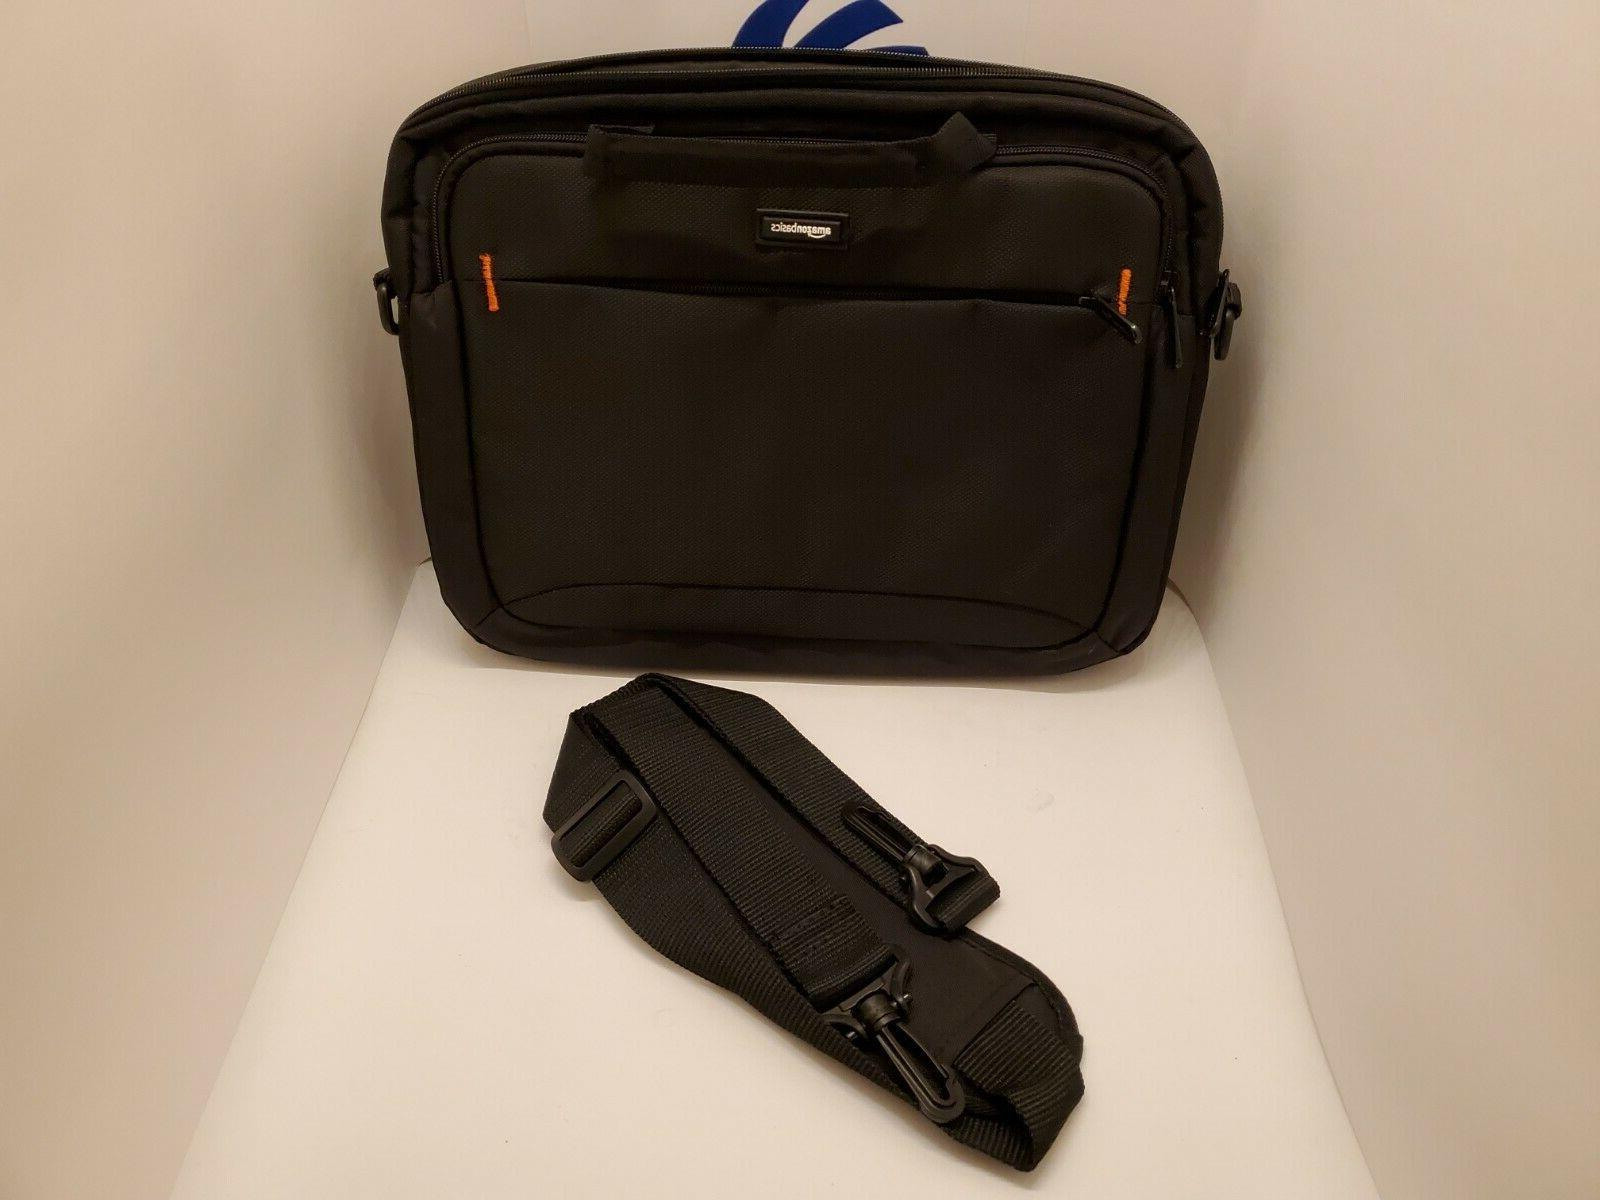 AmazonBasics 14-Inch Laptop Macbook and Tablet Shoulder Bag Carrying